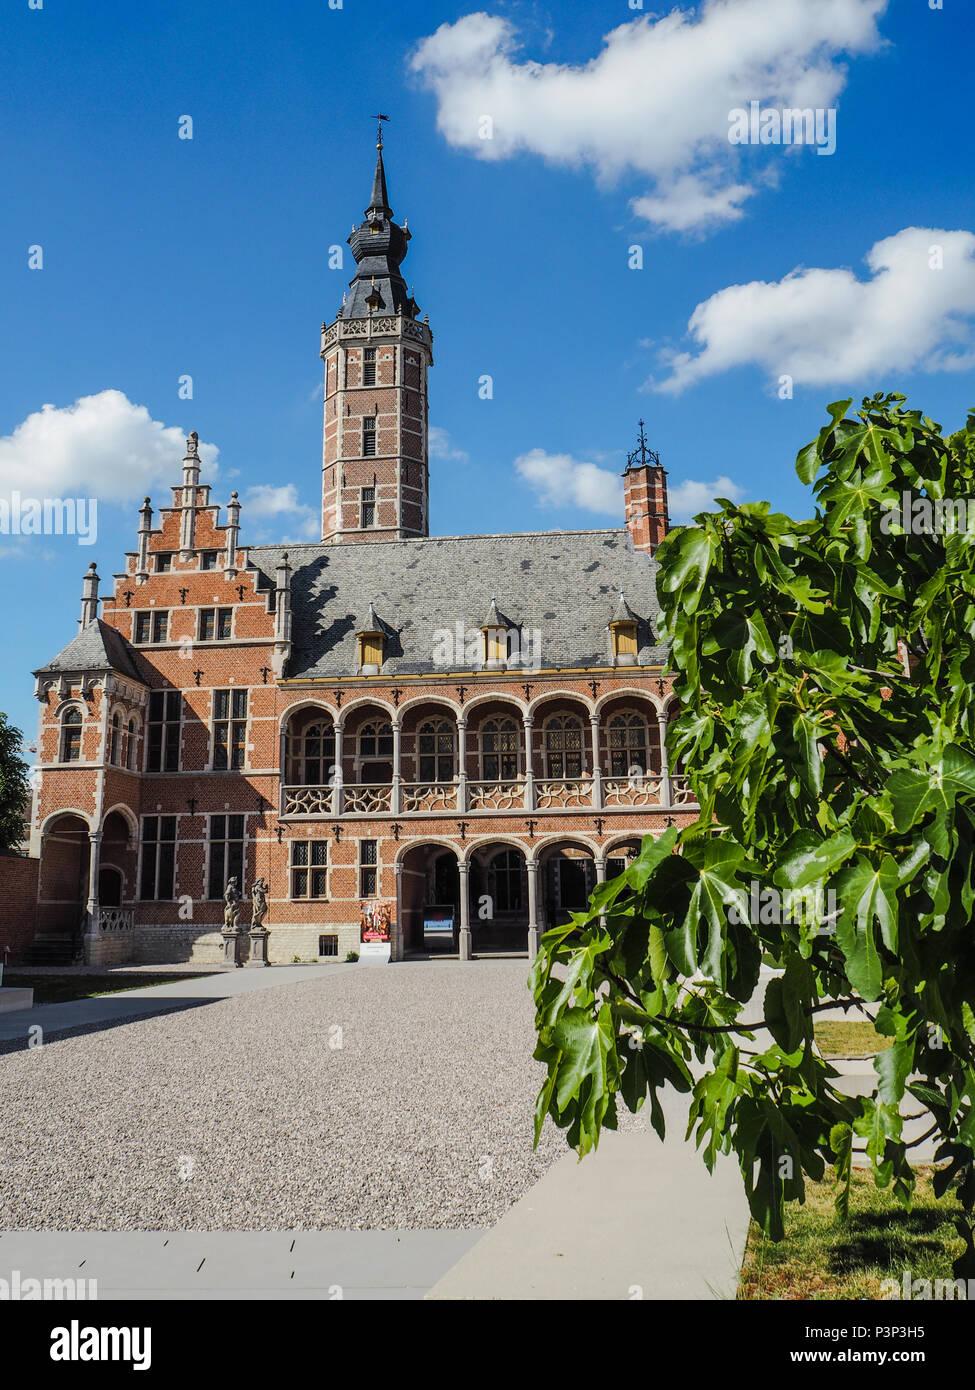 Main courtyard of the newly renovated museum Hof van Buysleyden focussing on Burgundian court culture, located in Mechelen, Belgium Stock Photo